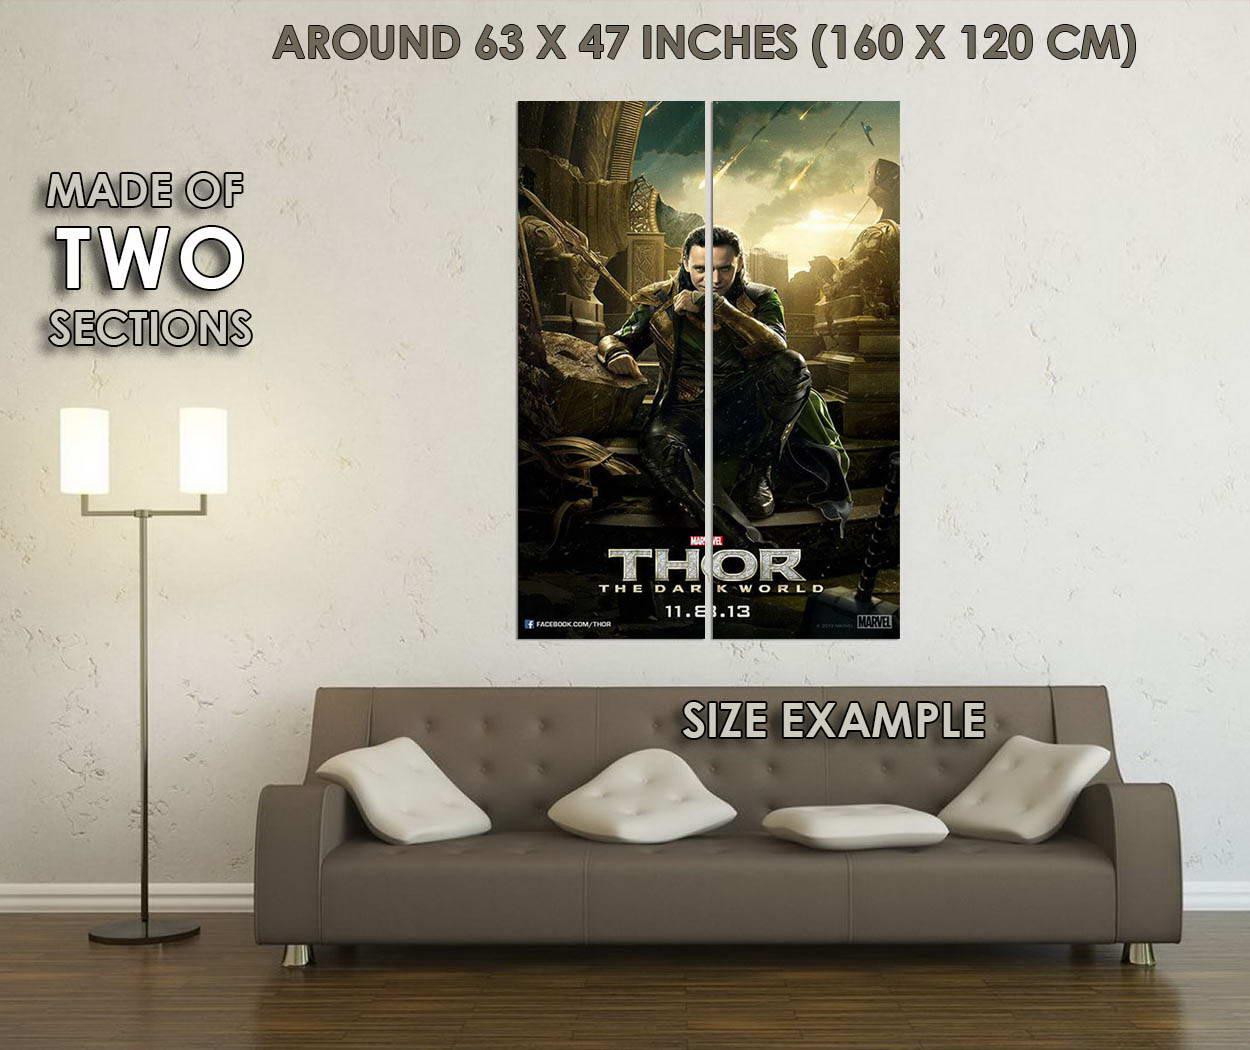 10149-Thor-2-The-Dark-World-Movie-Loki-LAMINATED-POSTER-CA thumbnail 6